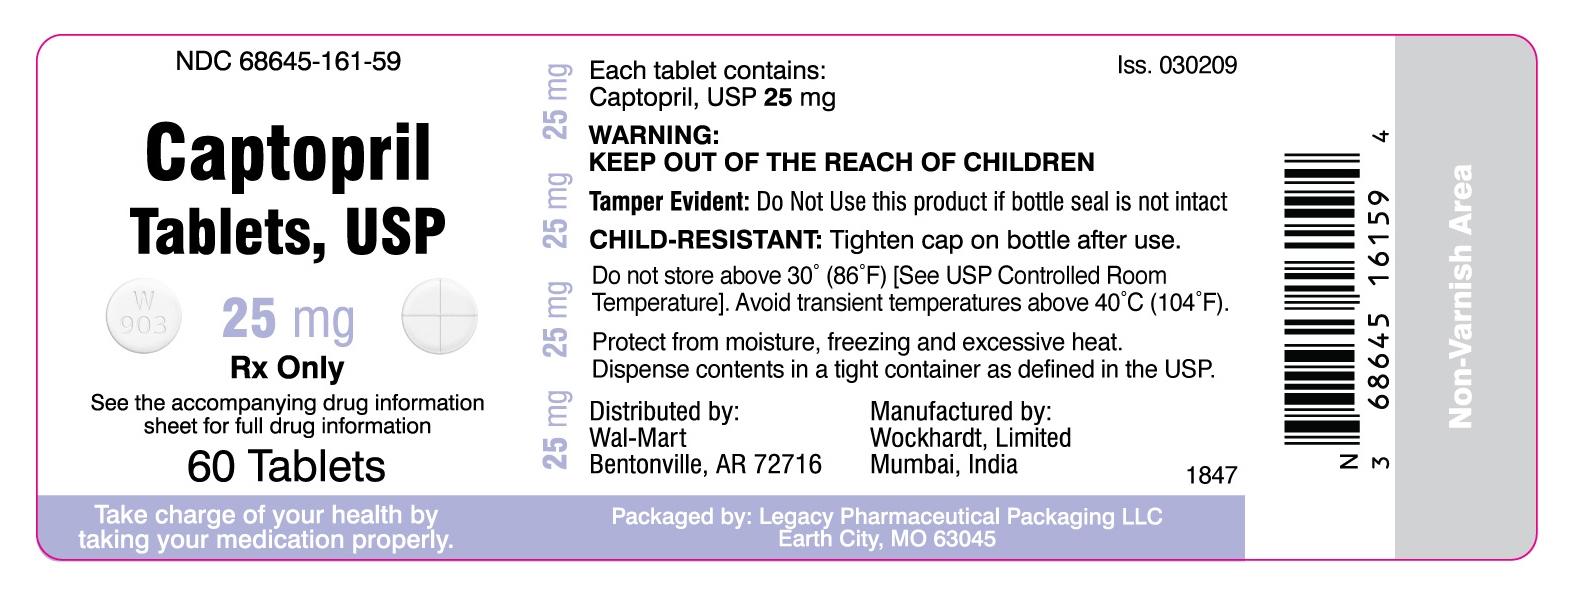 NDC 68645-161-59 Captopril Tablets, USP 25mg Rx Only 60 Tablets